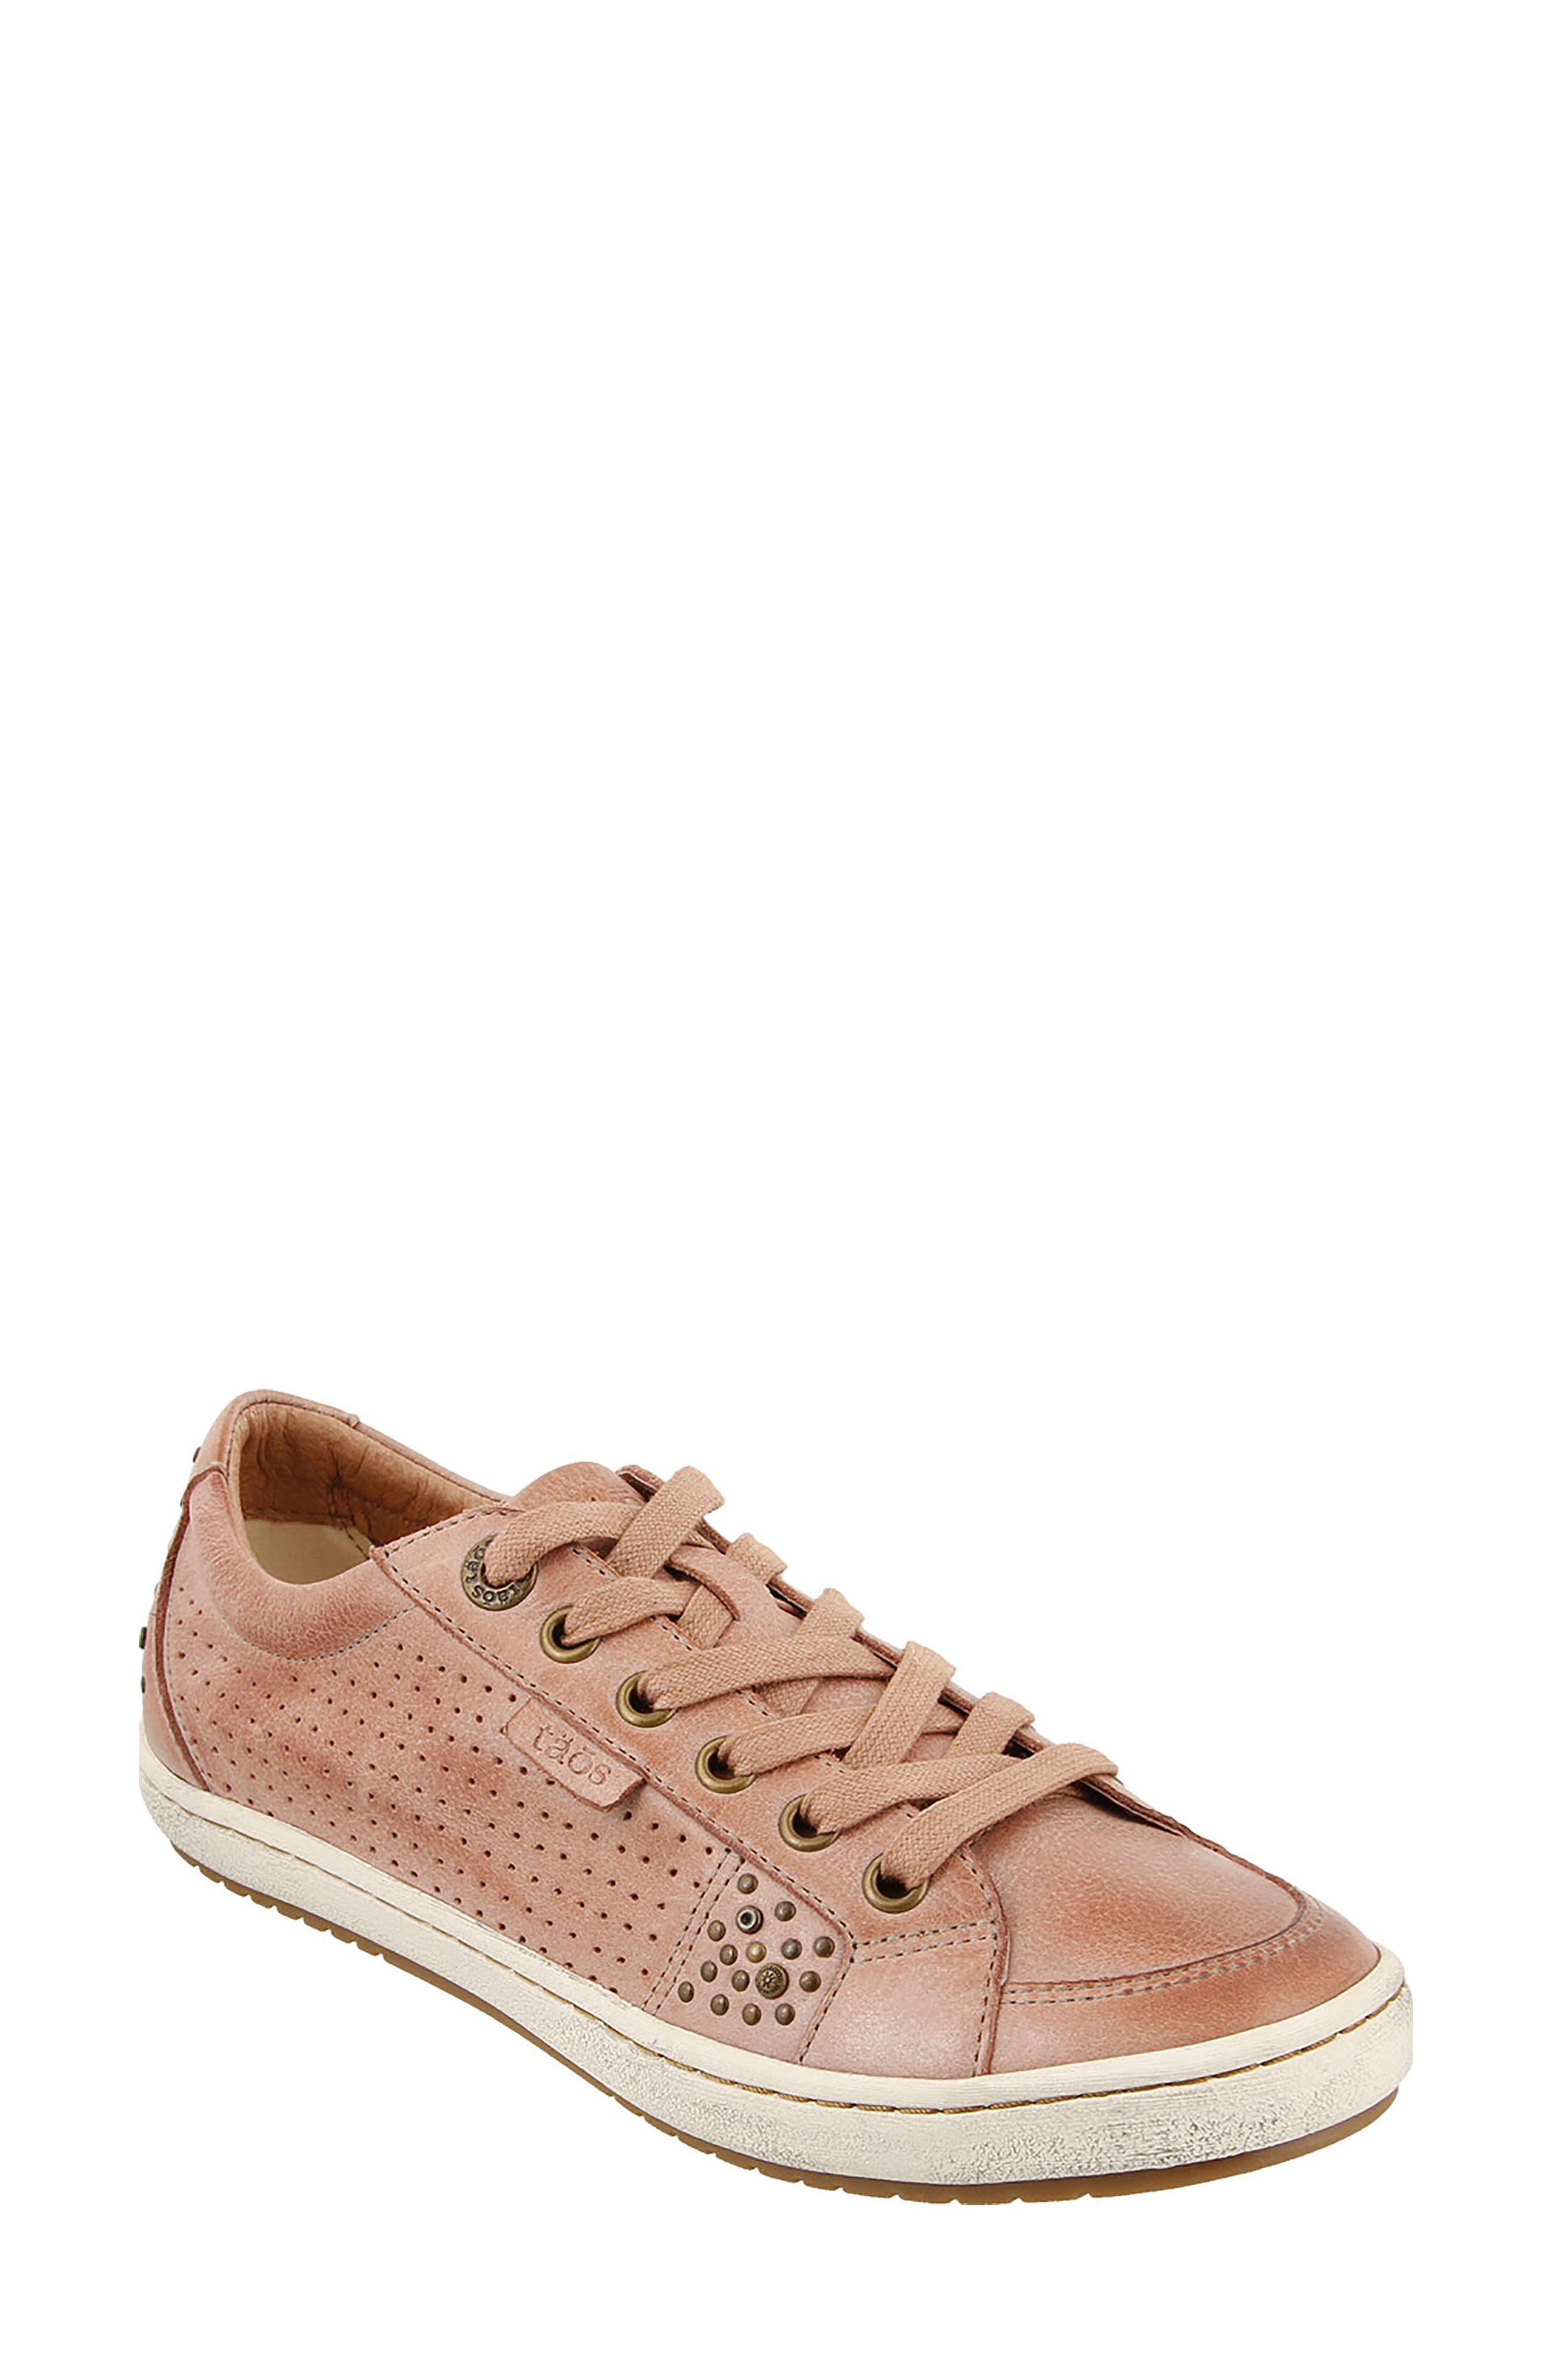 Main Image - Taos 'Freedom' Sneaker (Women)